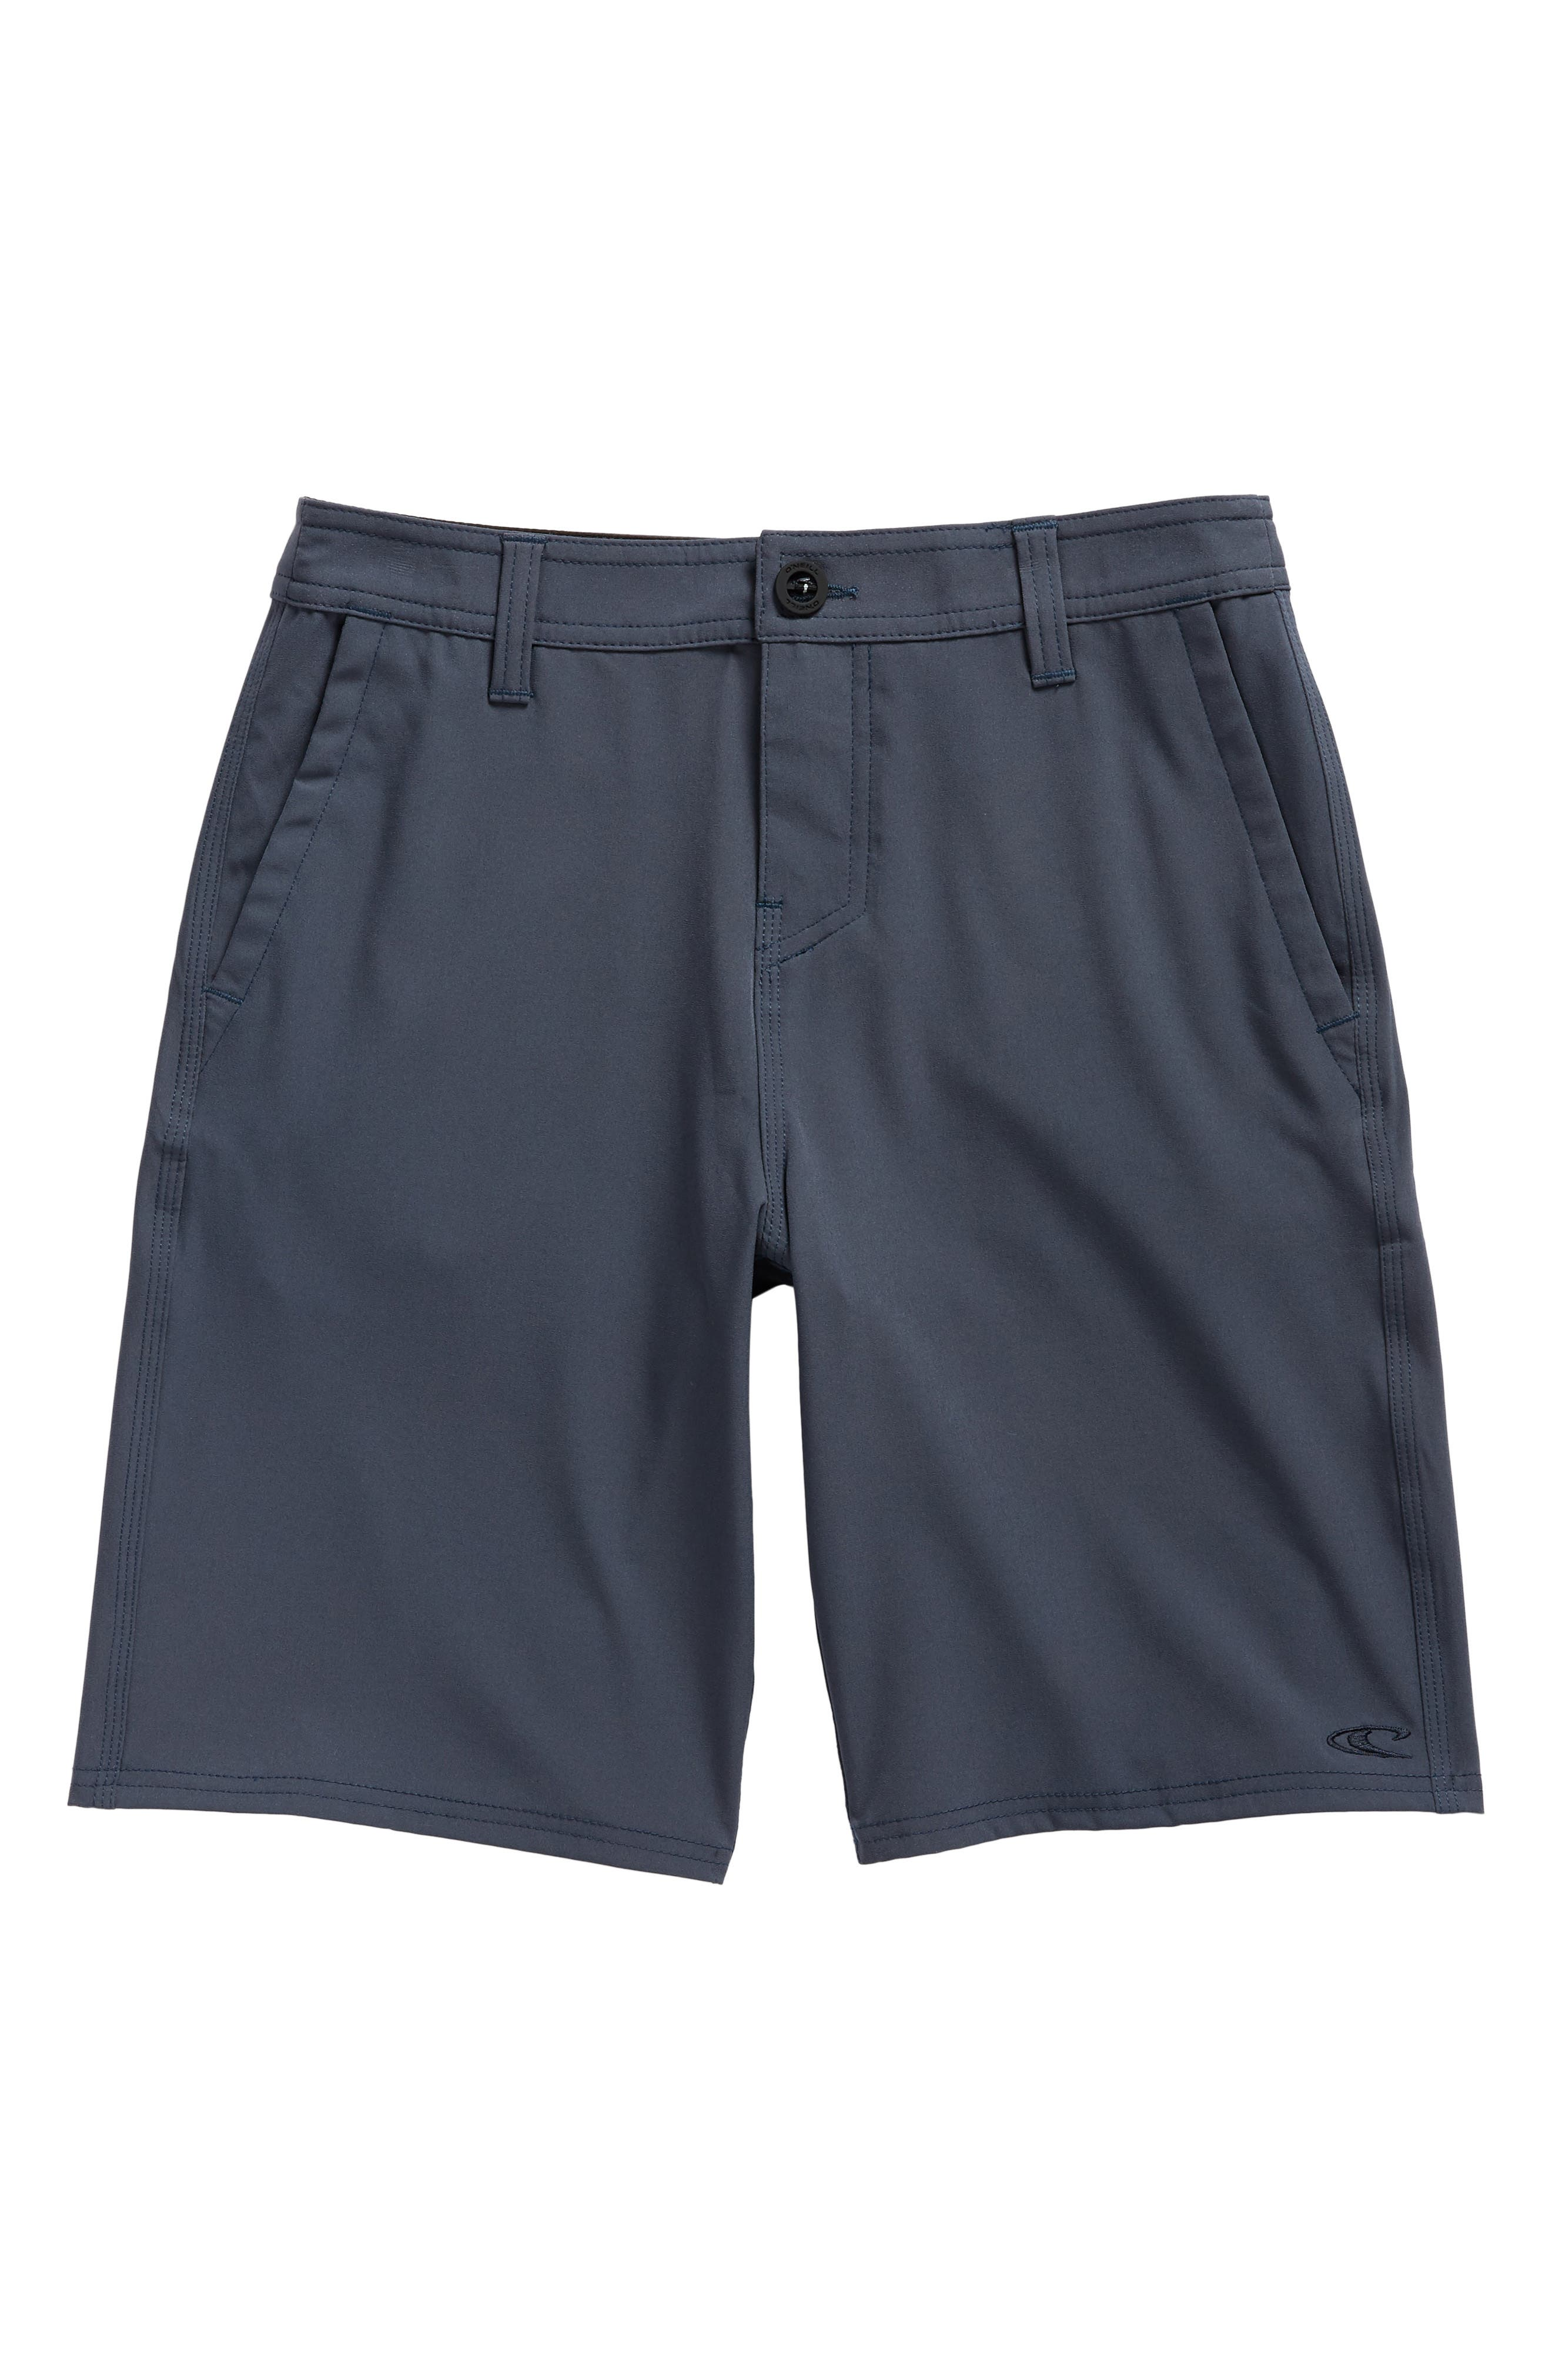 Loaded Hybrid Board Shorts,                         Main,                         color, Slate